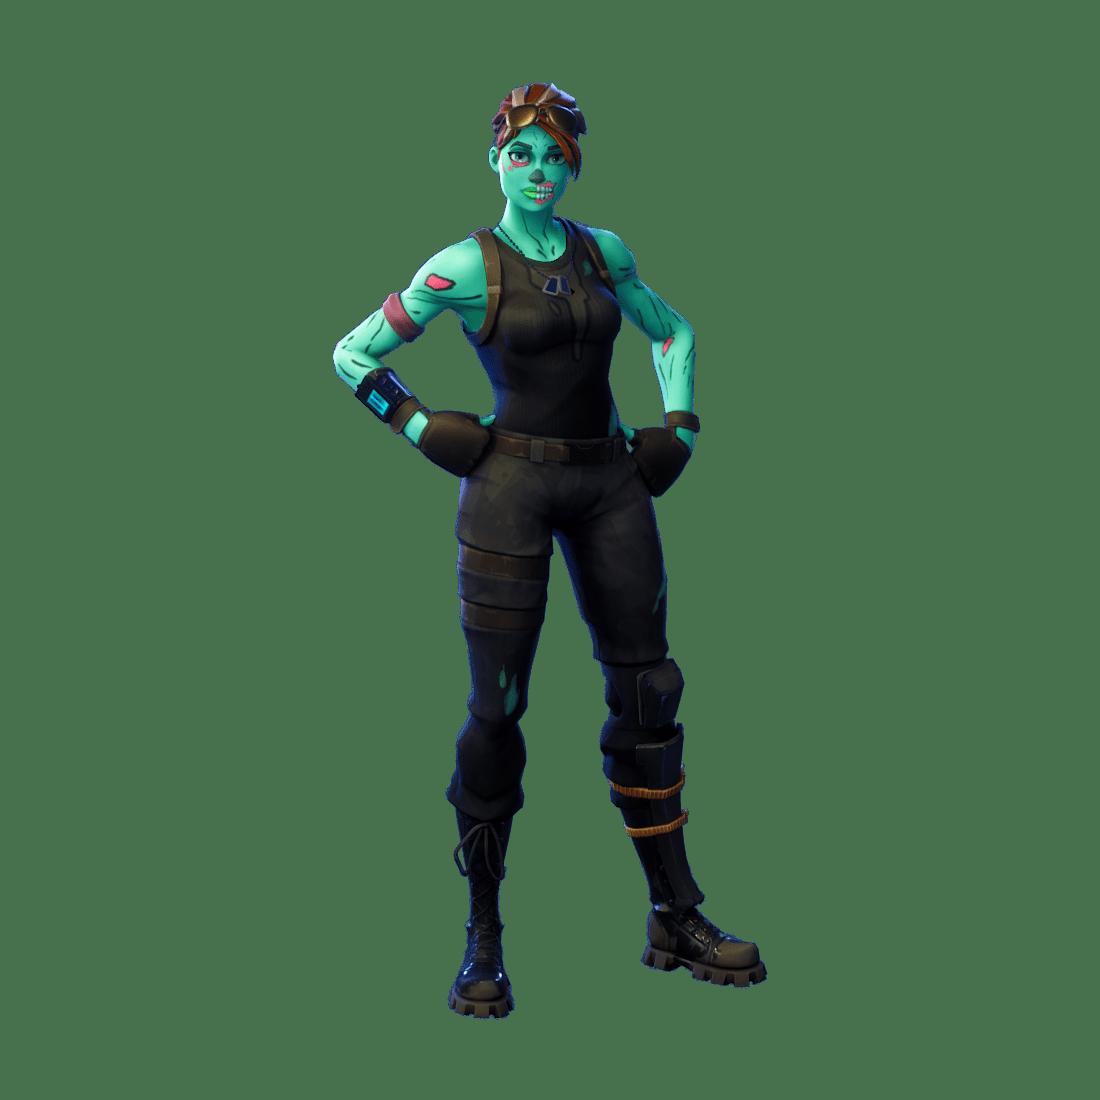 FortnitFortnite Skin - Ghoul Troopere Skin Ghoul Trooper